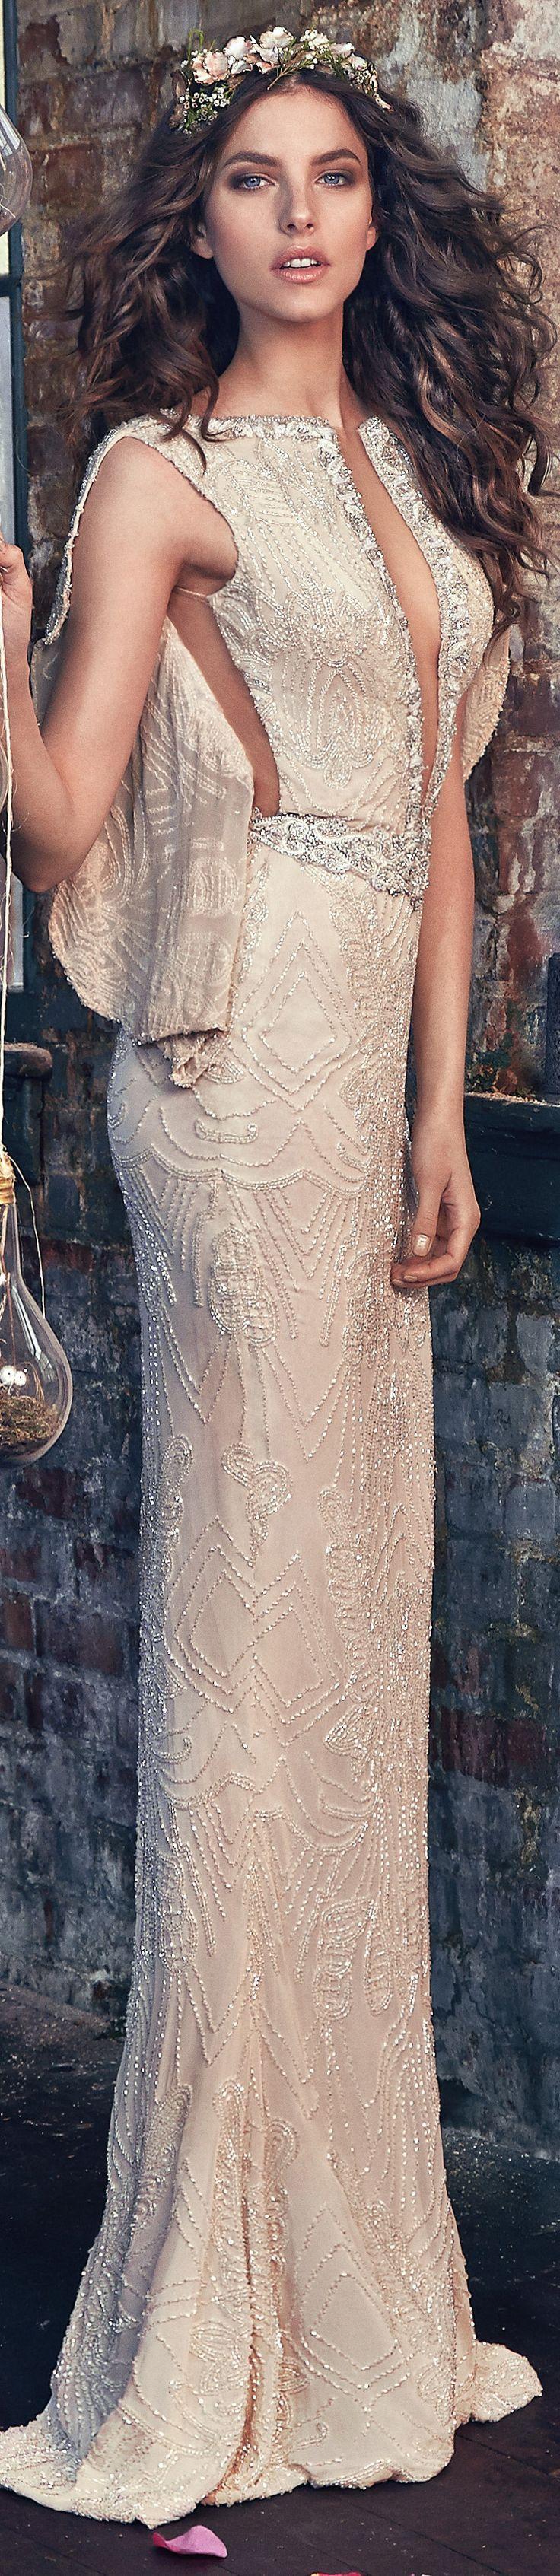 best fashion red carpet images on pinterest tank dress cute